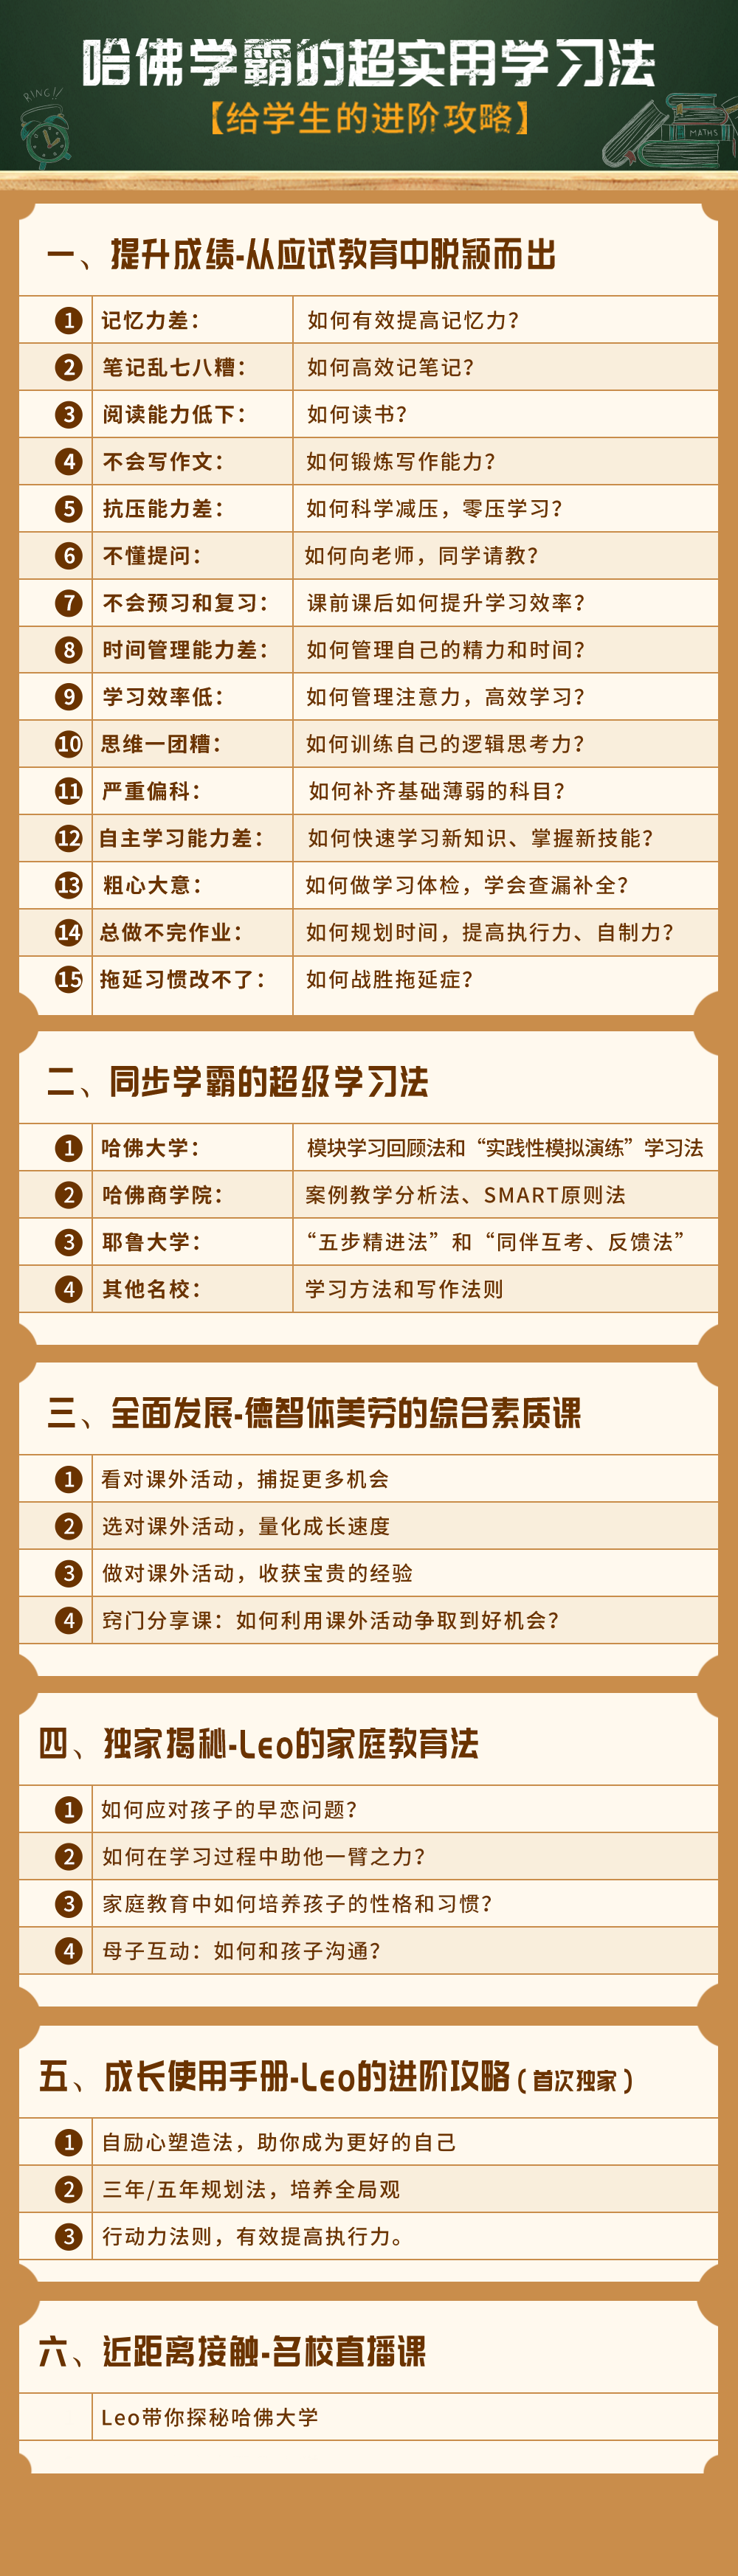 leo-课表.png